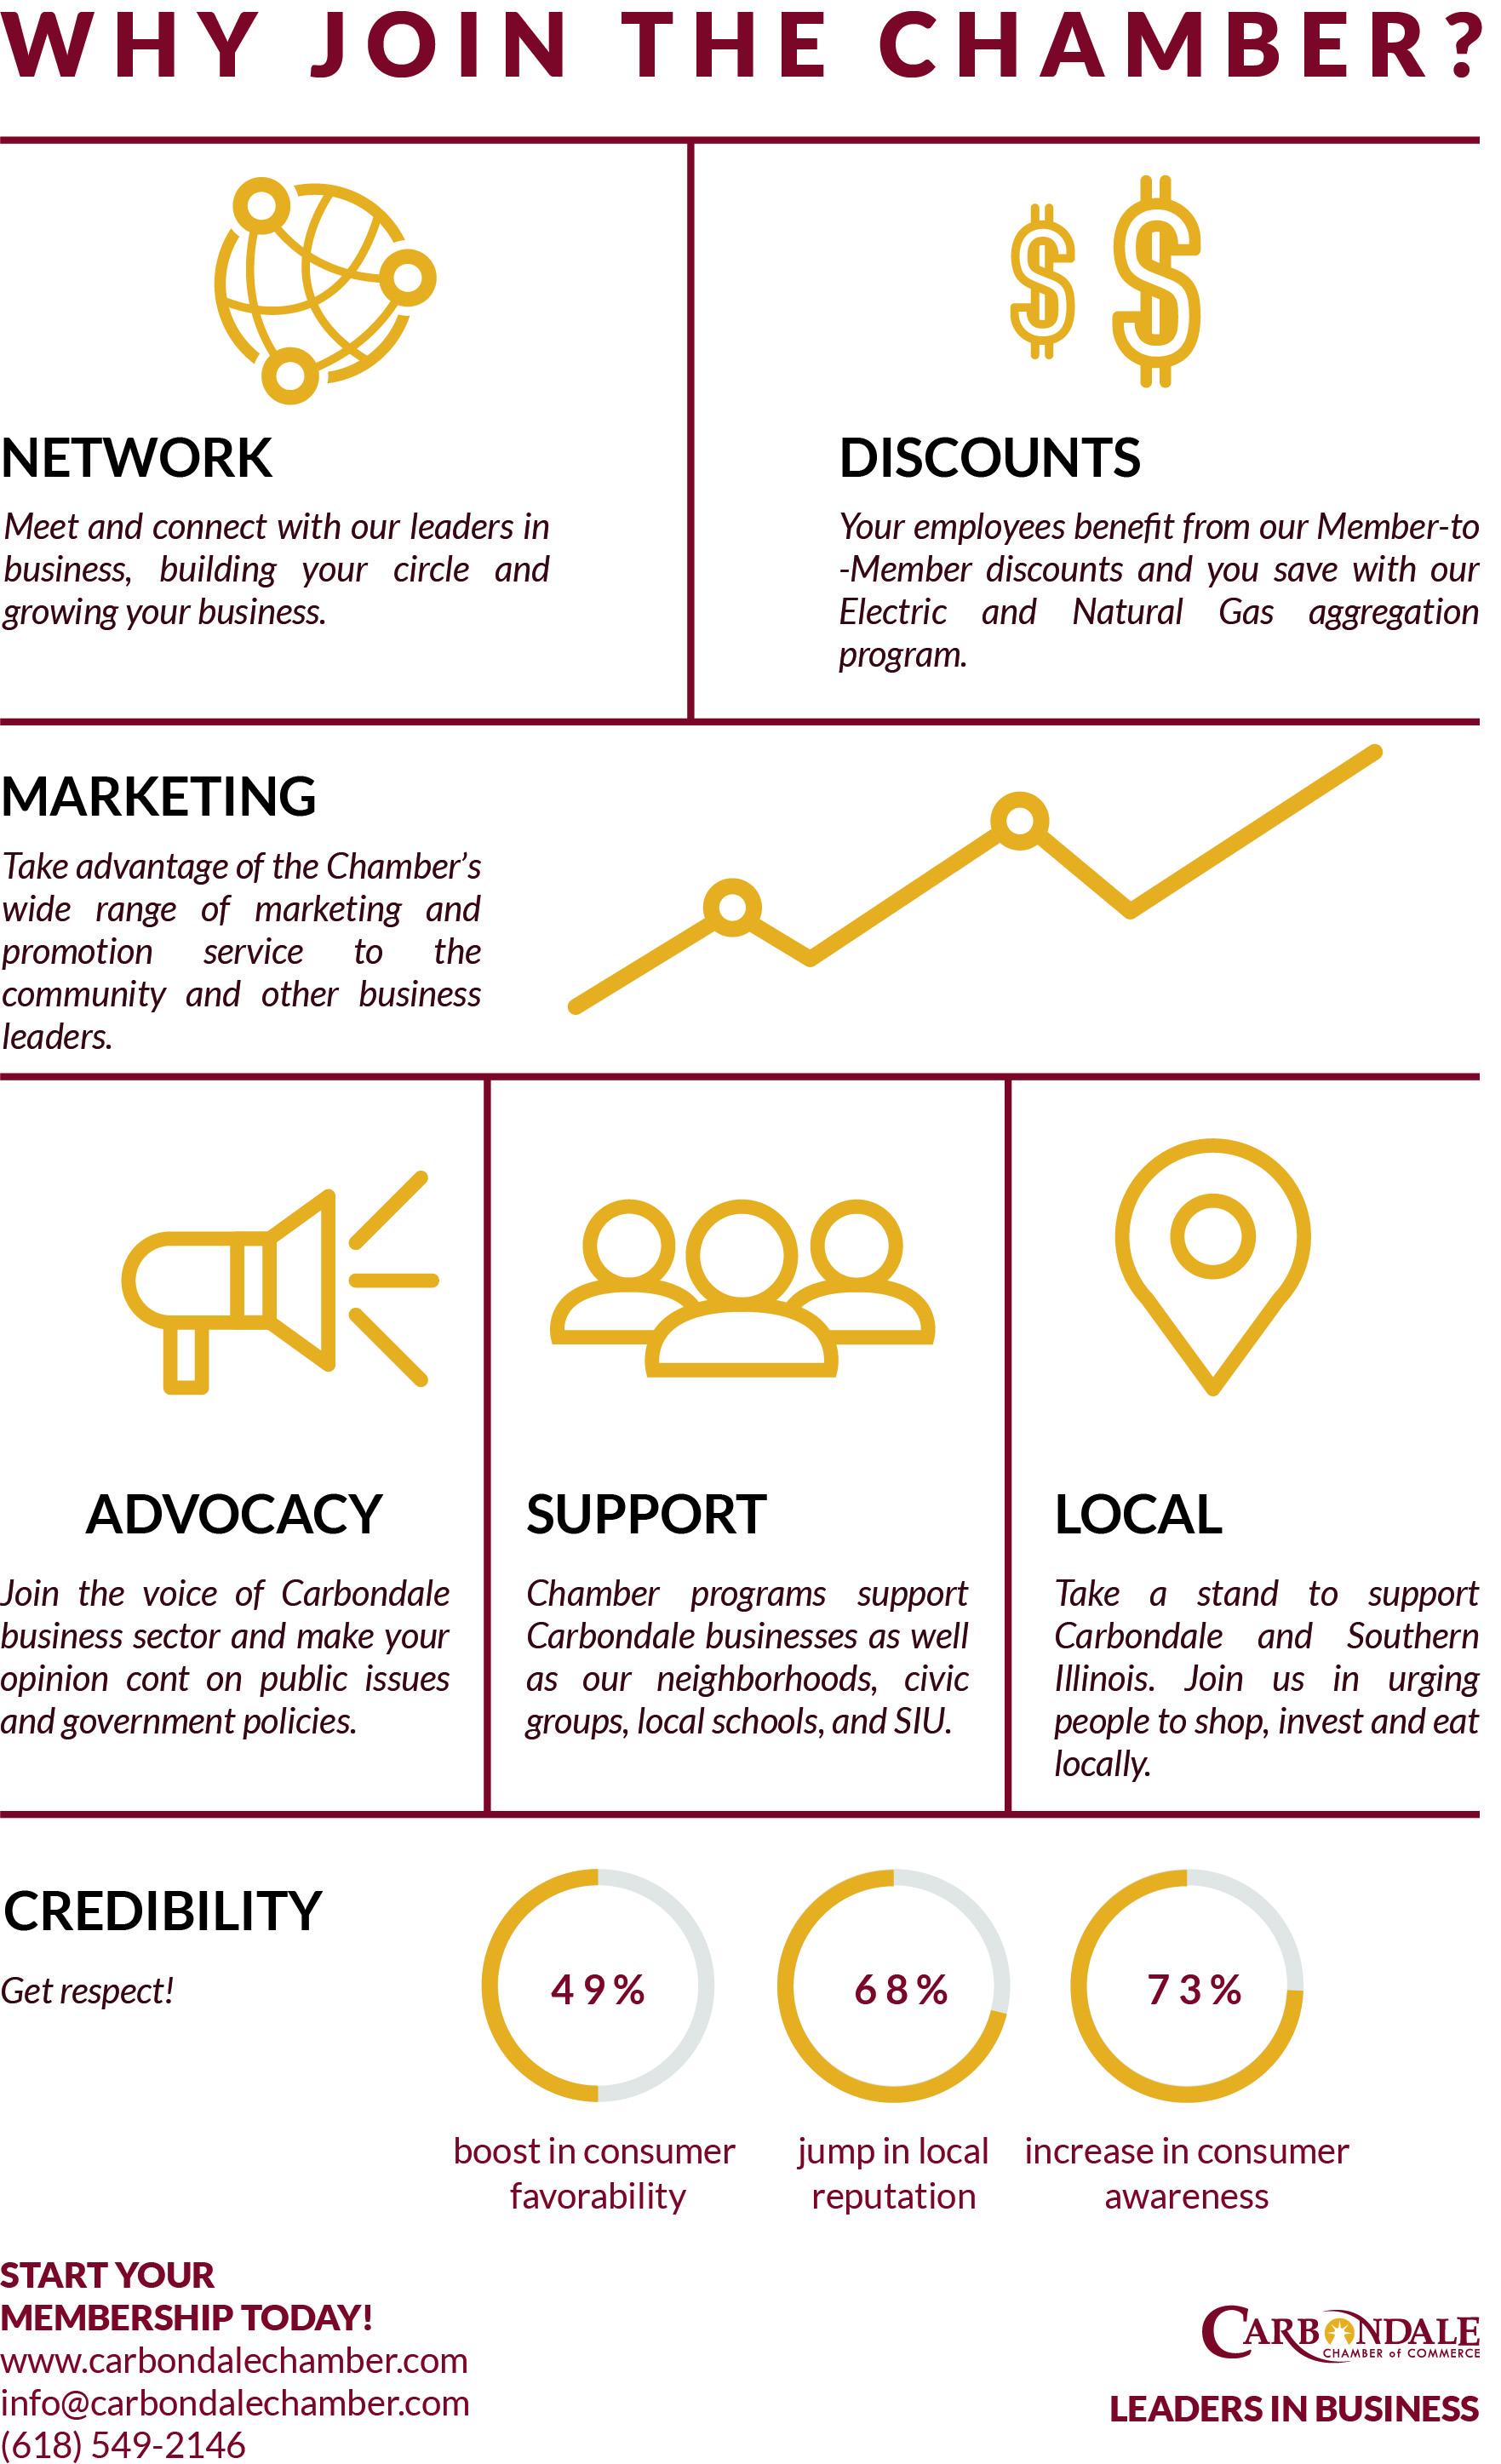 Member-Benefits-1.jpg